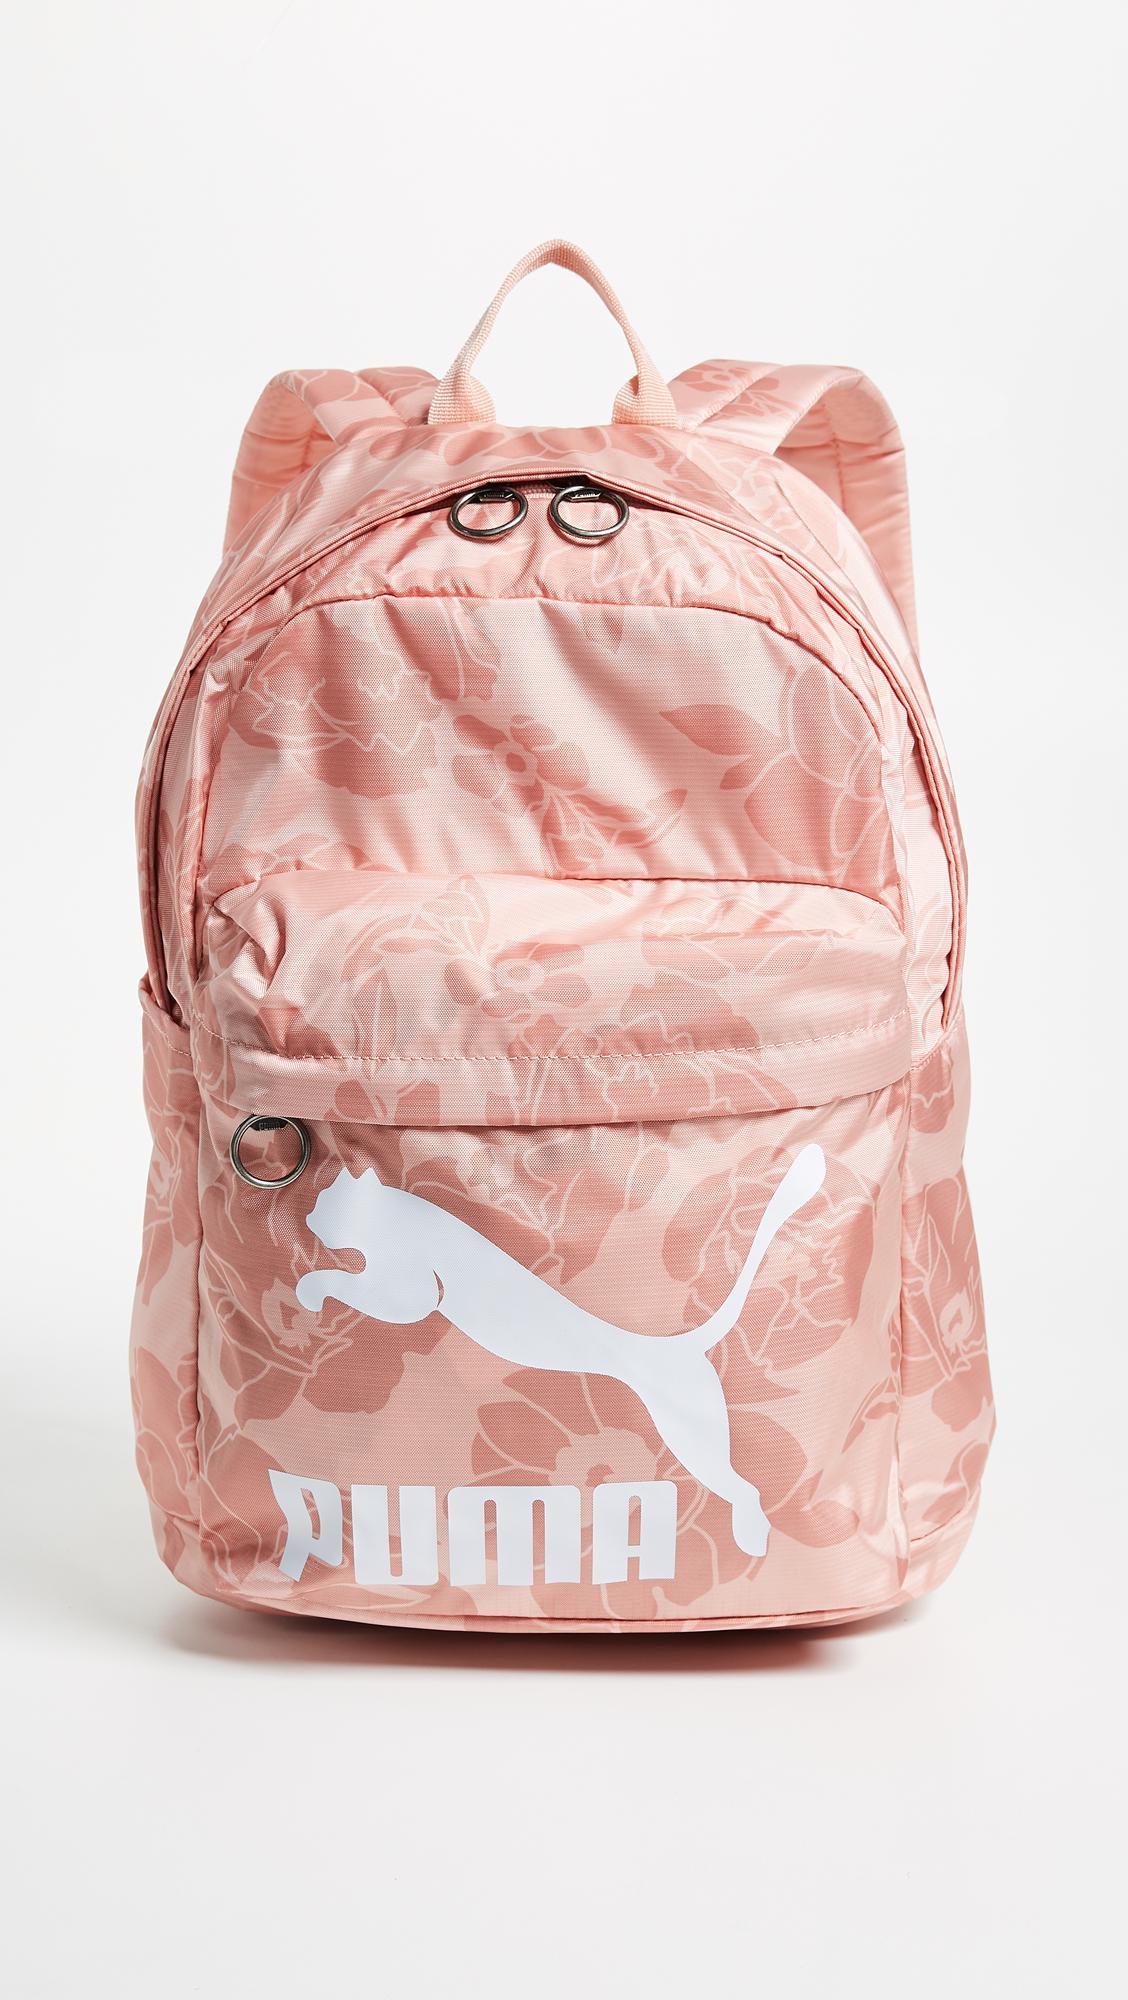 Puma Originals Backpack Rucksack in Pink - Lyst d3516e3a7fe